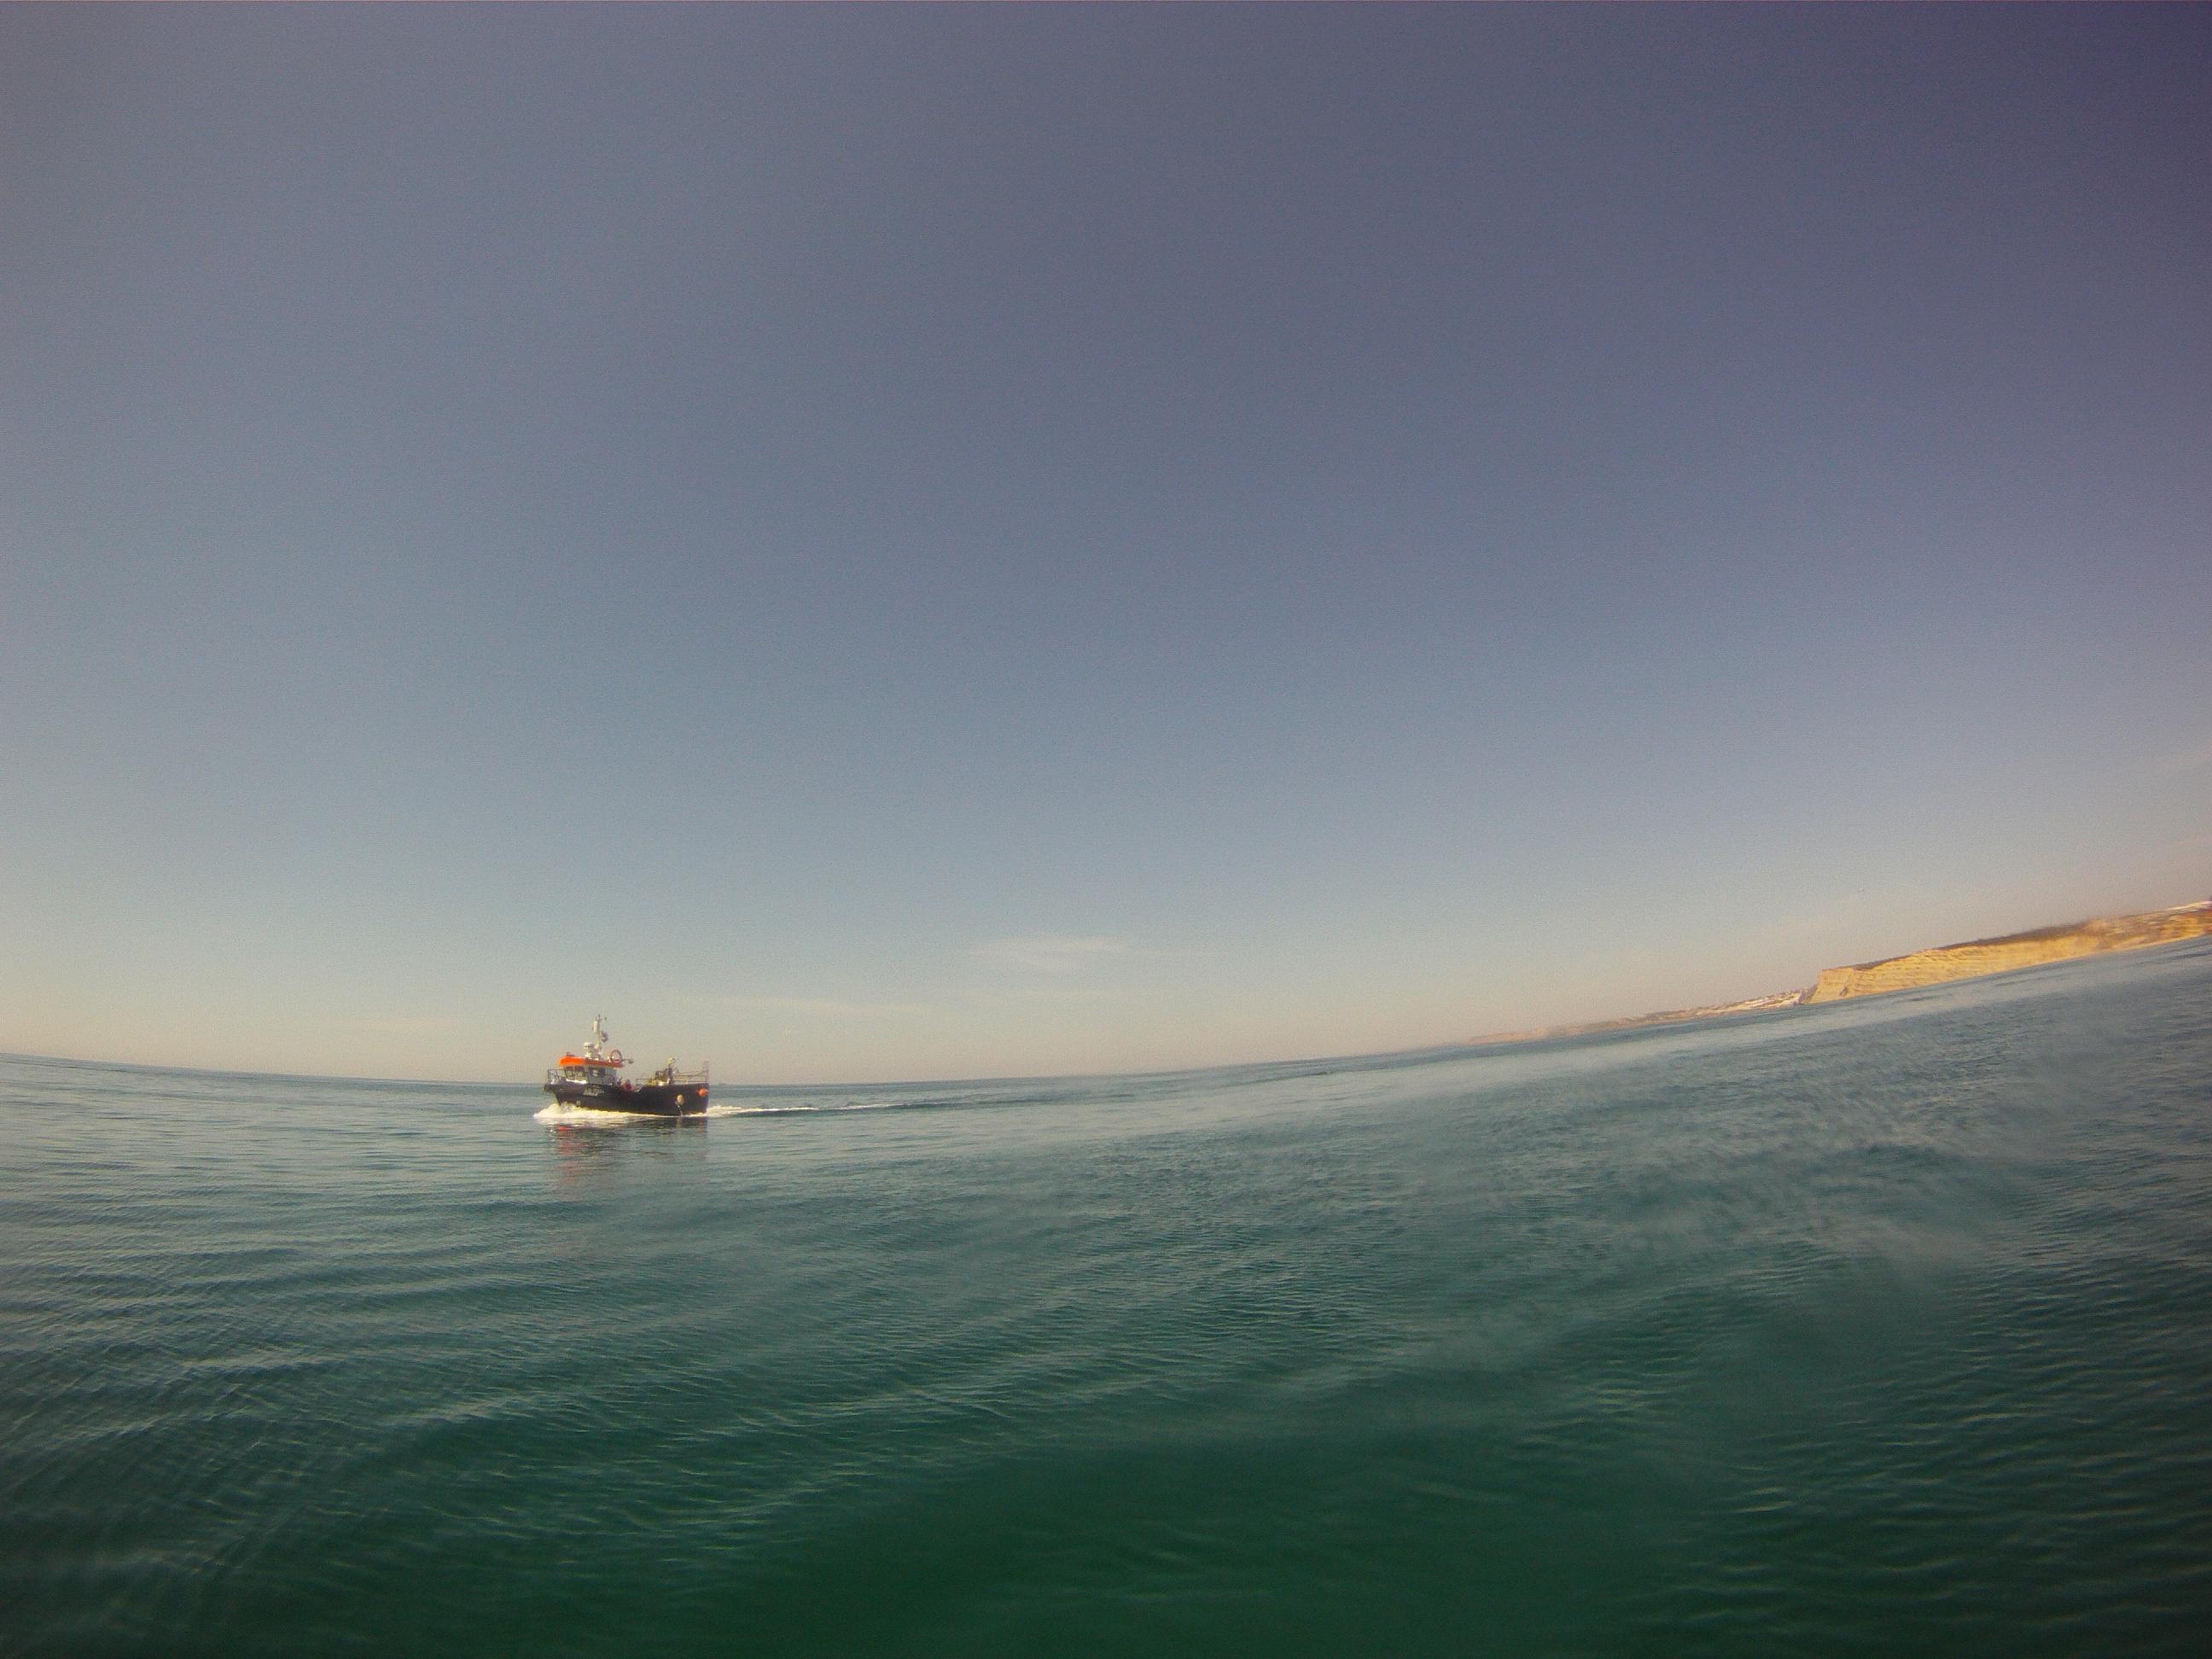 meia praia fishing boat